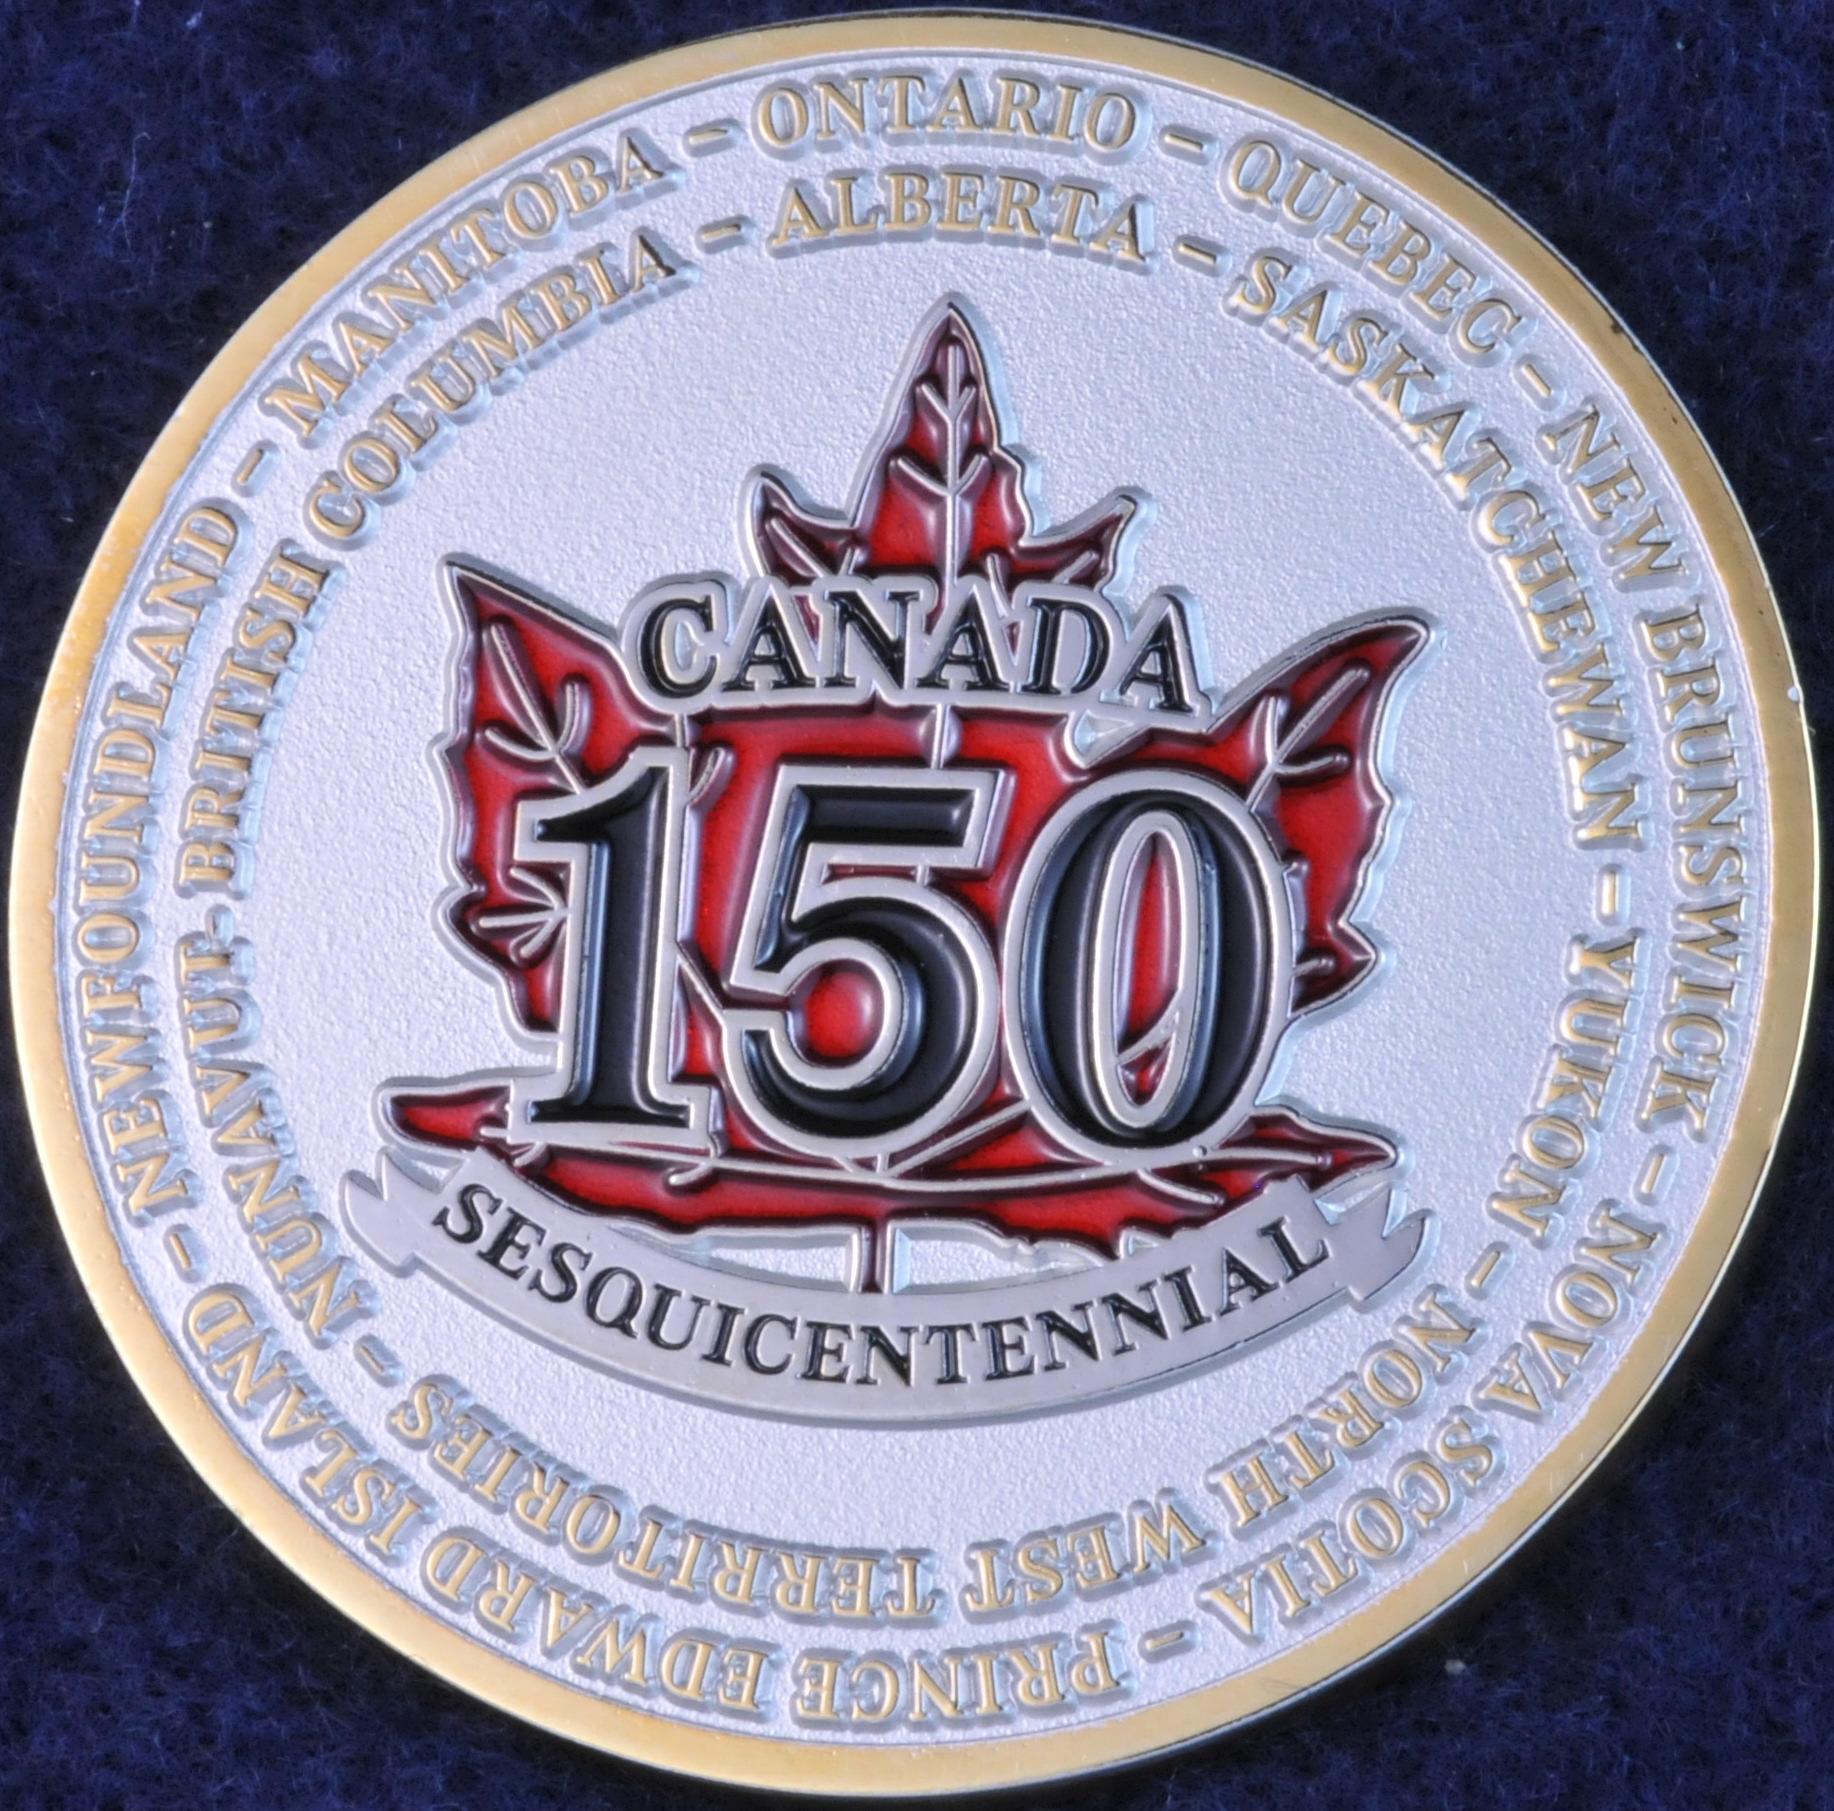 International Police Association Canada 150 ...